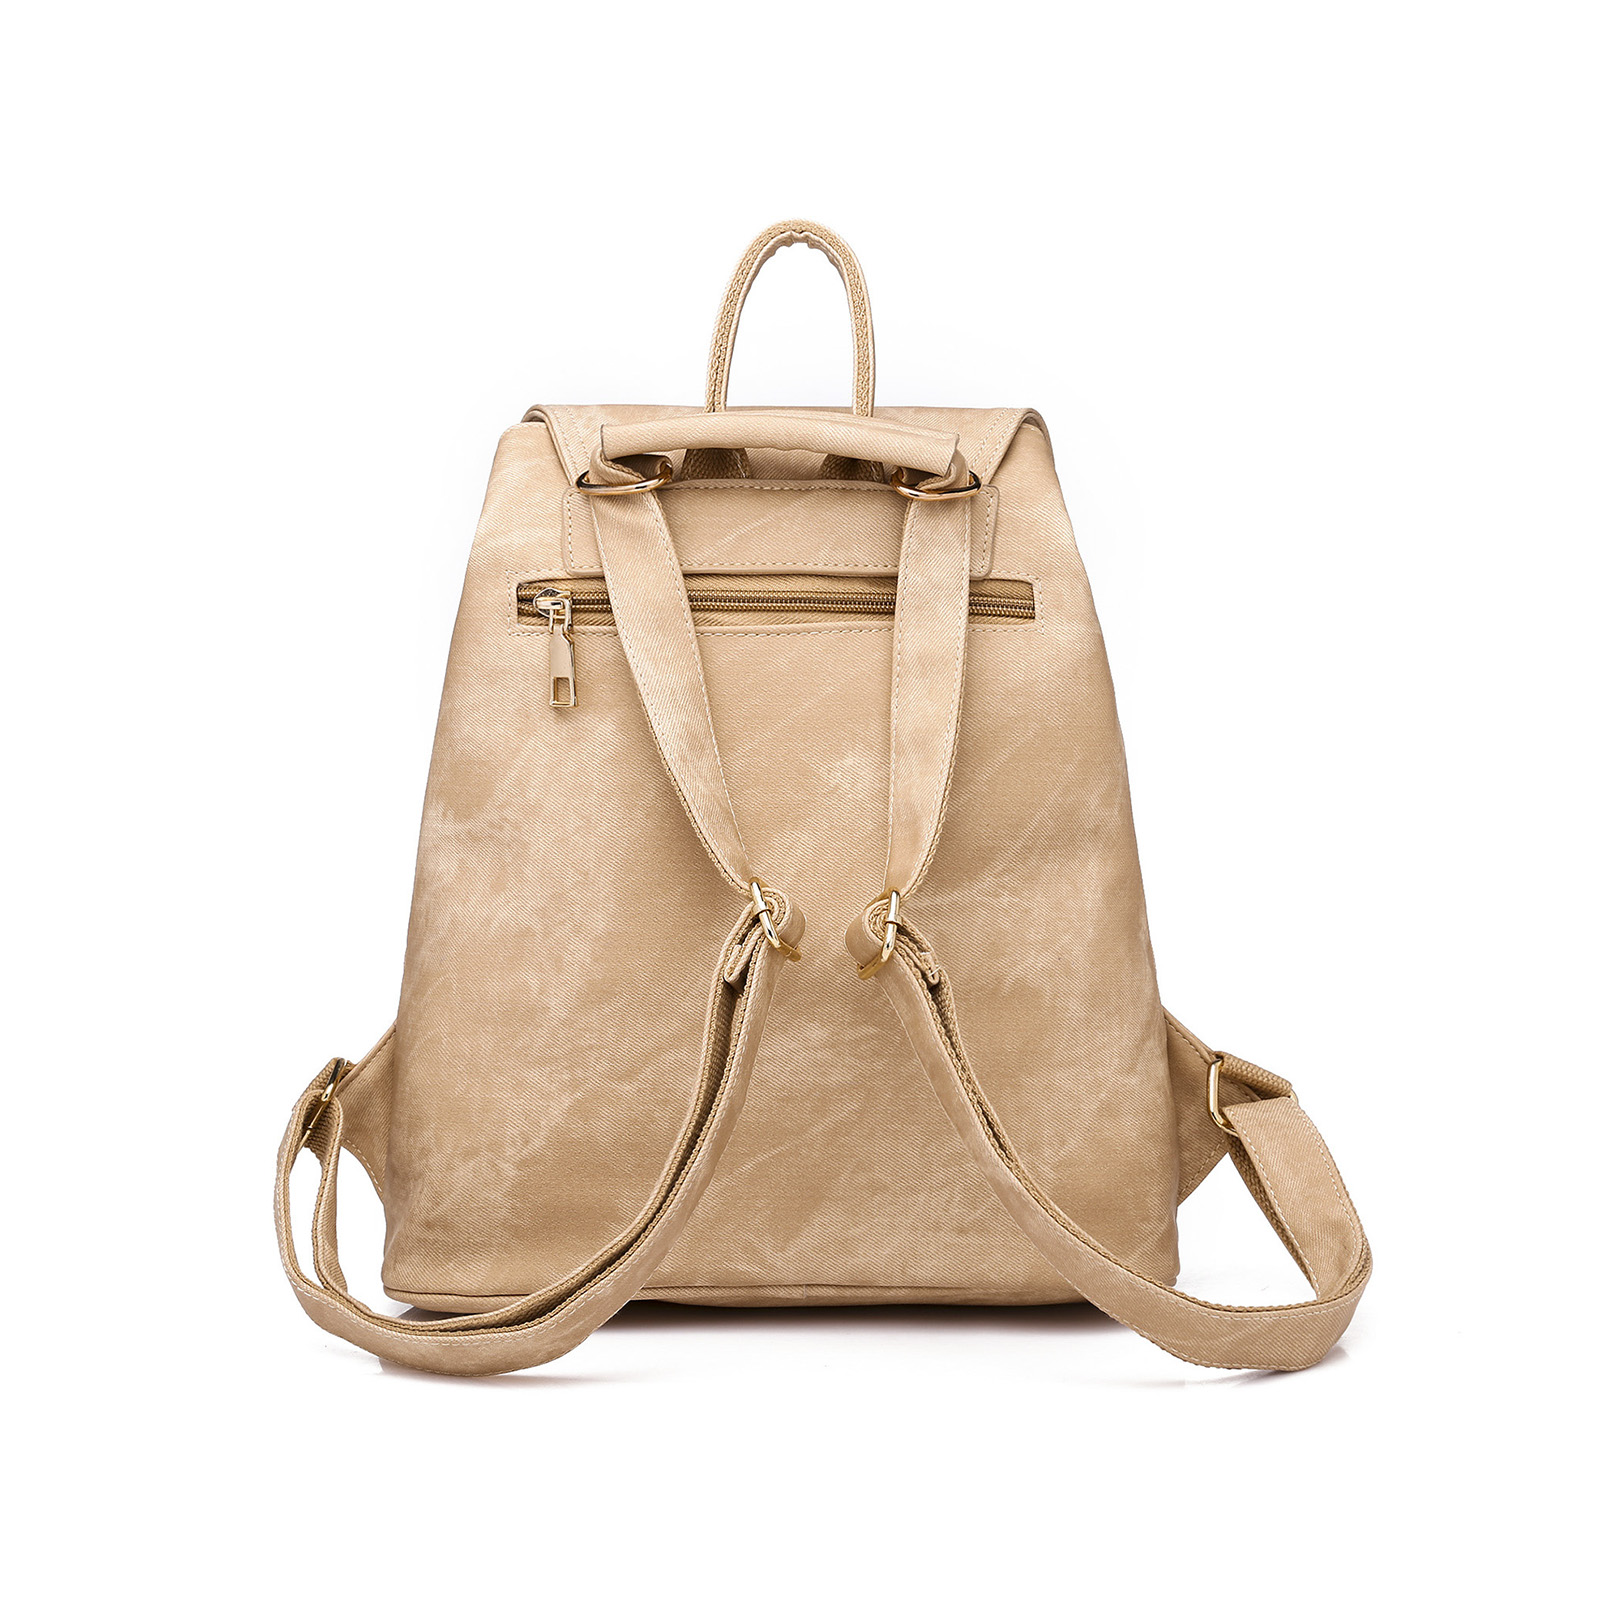 2019 2pcs Set Causal Women Backpack PU Leather School Bag for Teenager Girls Softback Female Backpacks Multi pocket Shoulder Bag in Backpacks from Luggage Bags